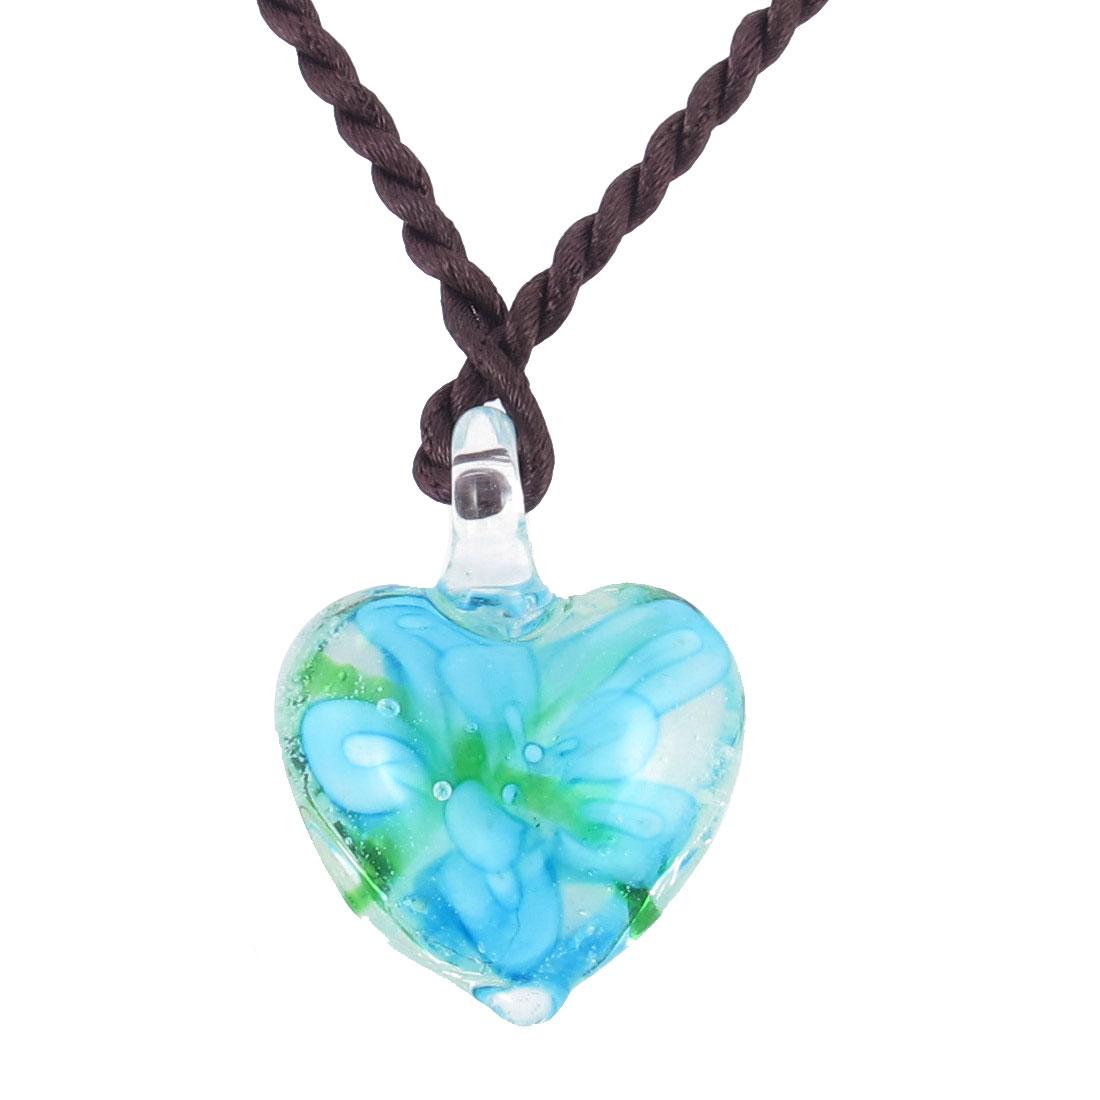 Braided Rope 3D Flower Inside Heart Style Glass Pendant Necklace Light Blue